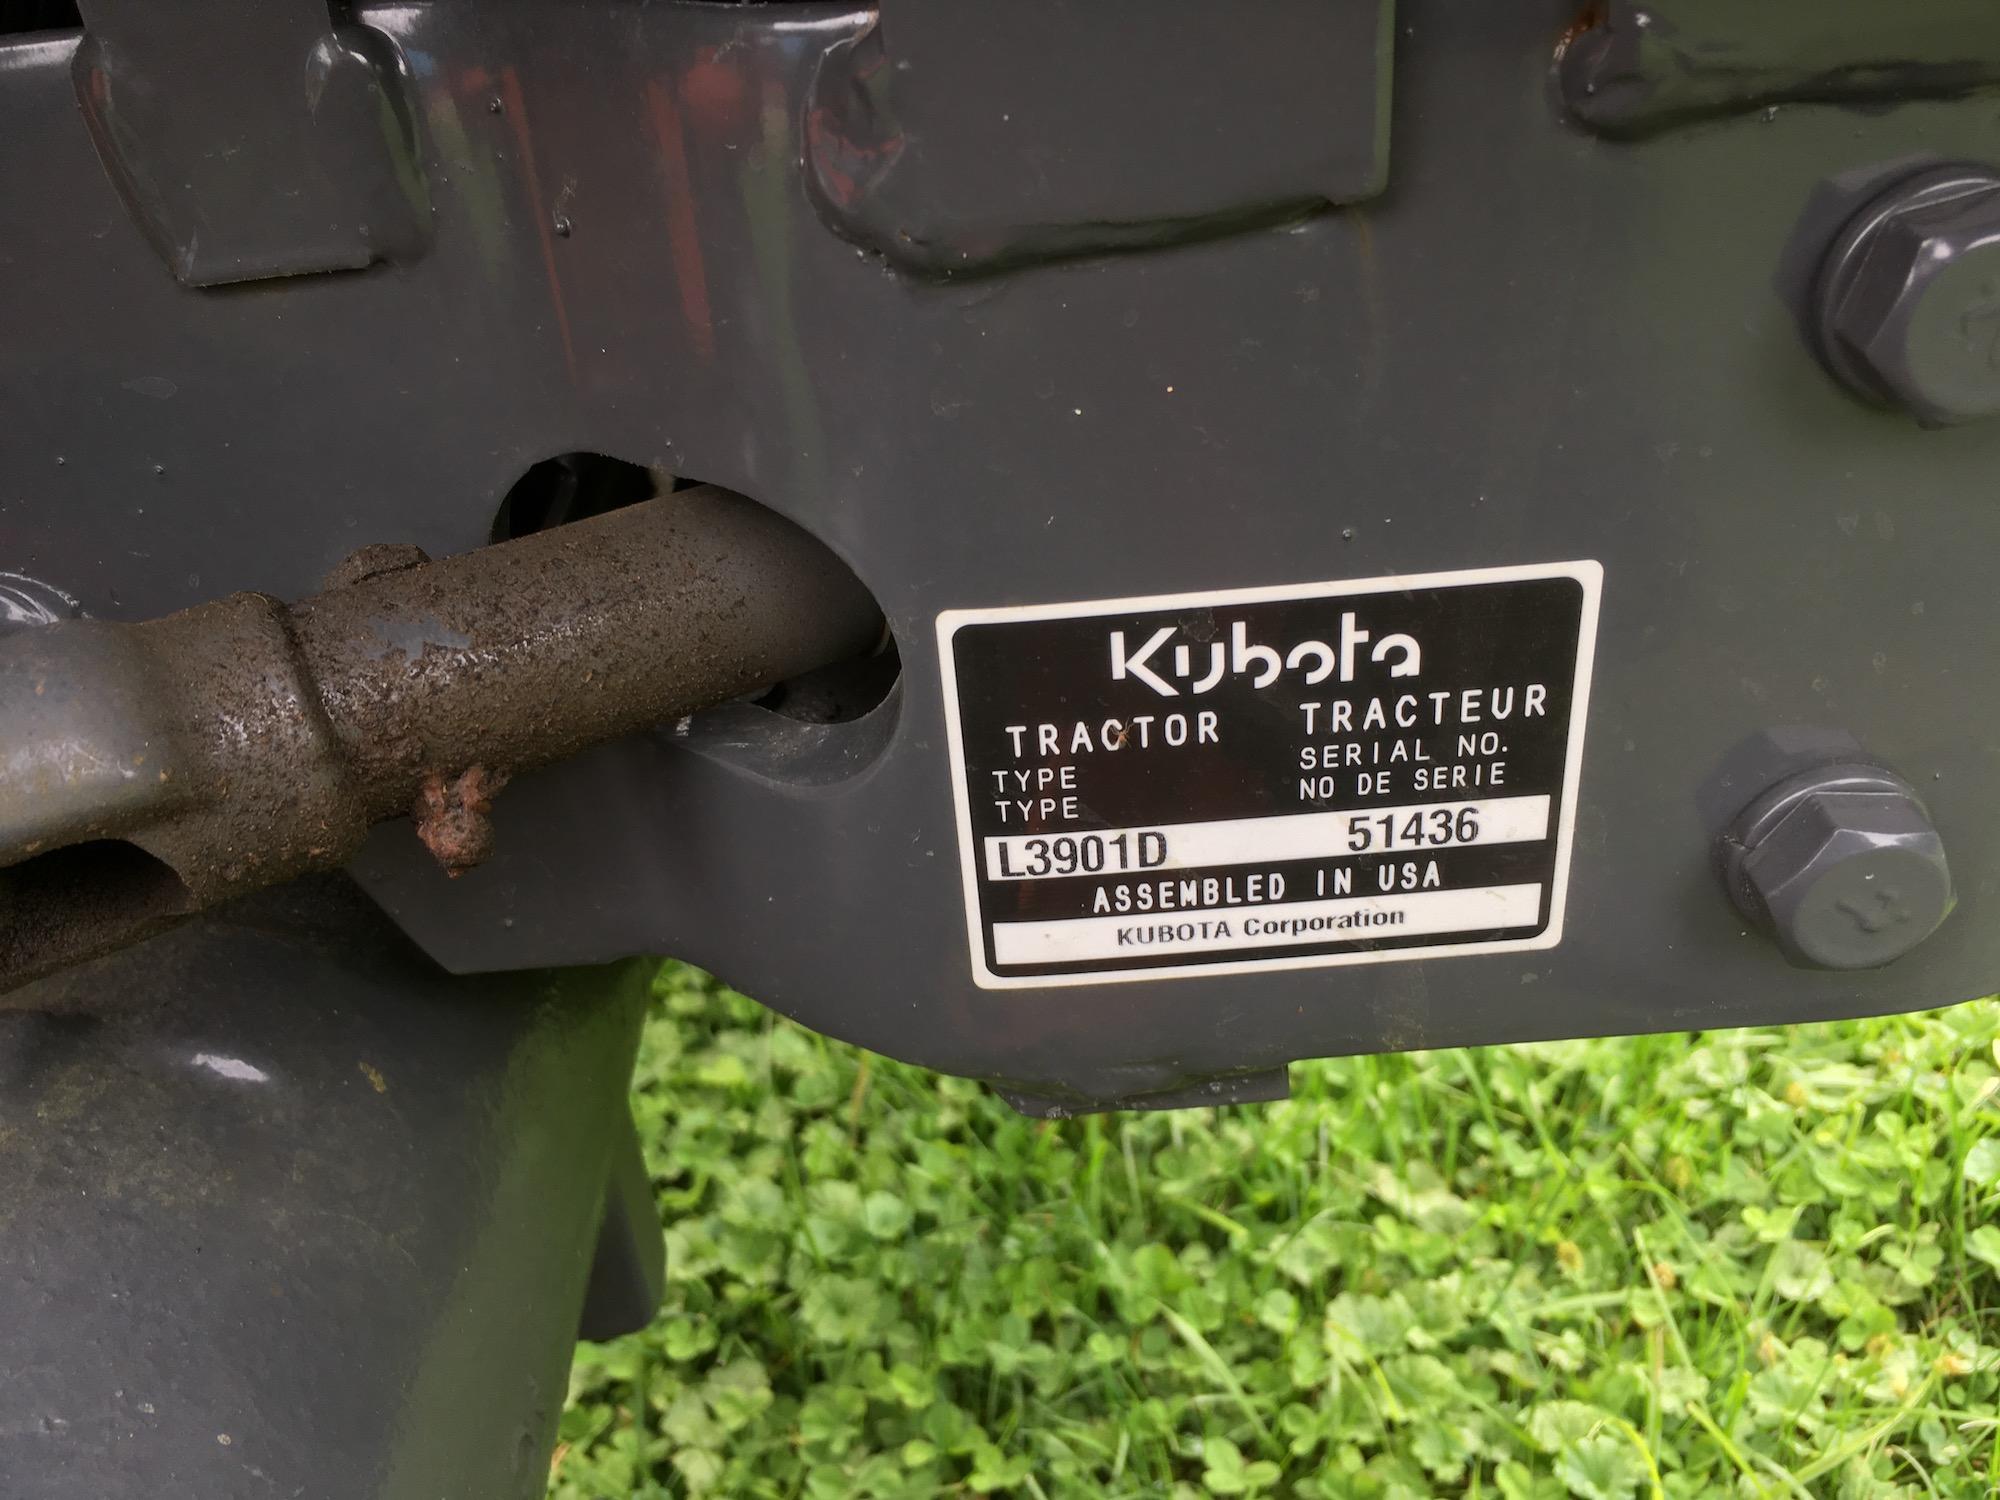 Kubota-L3901D-Tractor_LA525-Loader-06